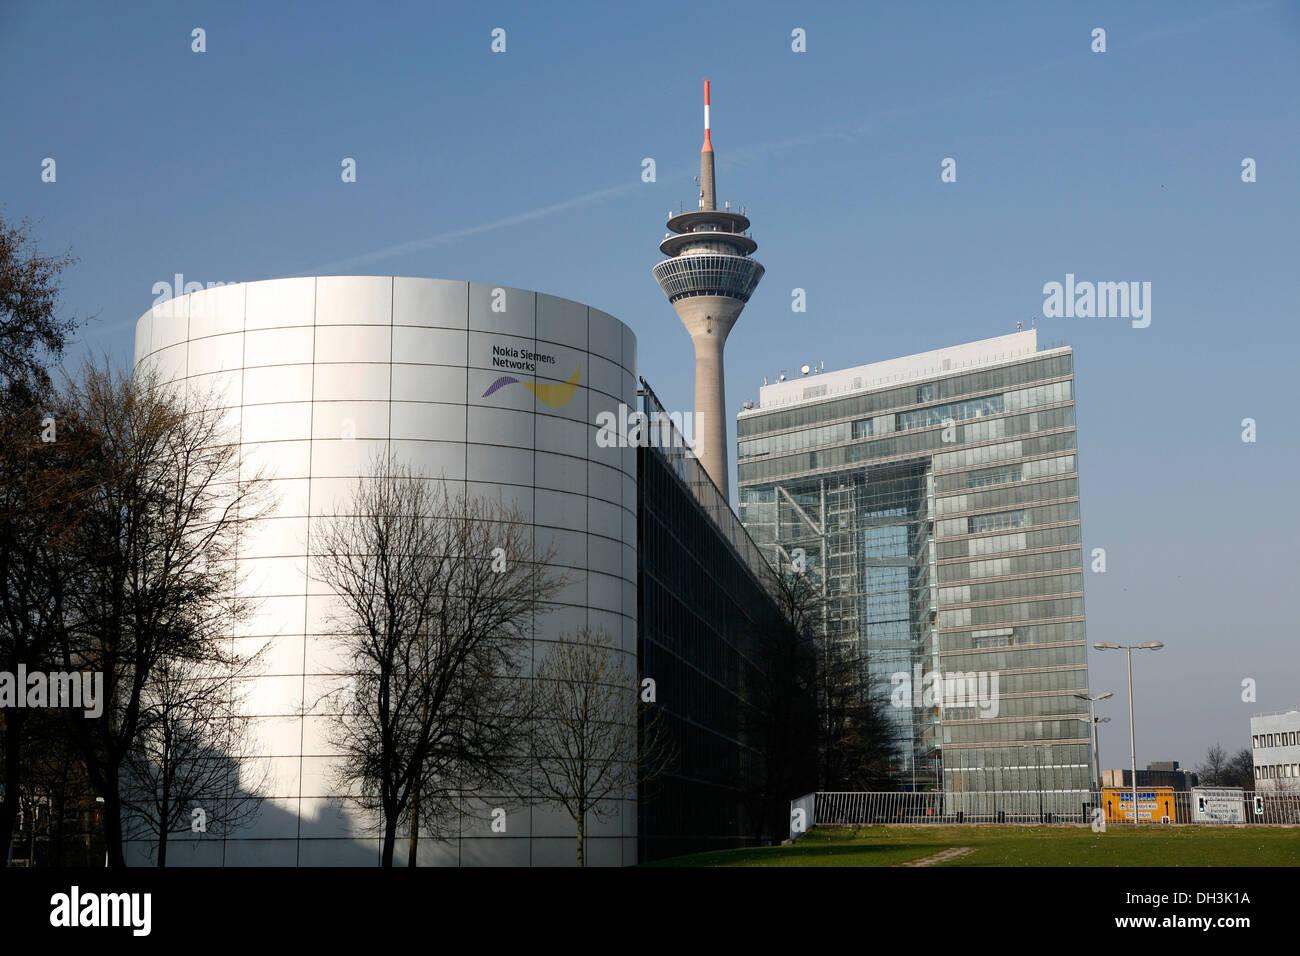 Stadttor, City Gate skyscraper, Duesseldorf, North Rhine-Westphalia Stock Photo